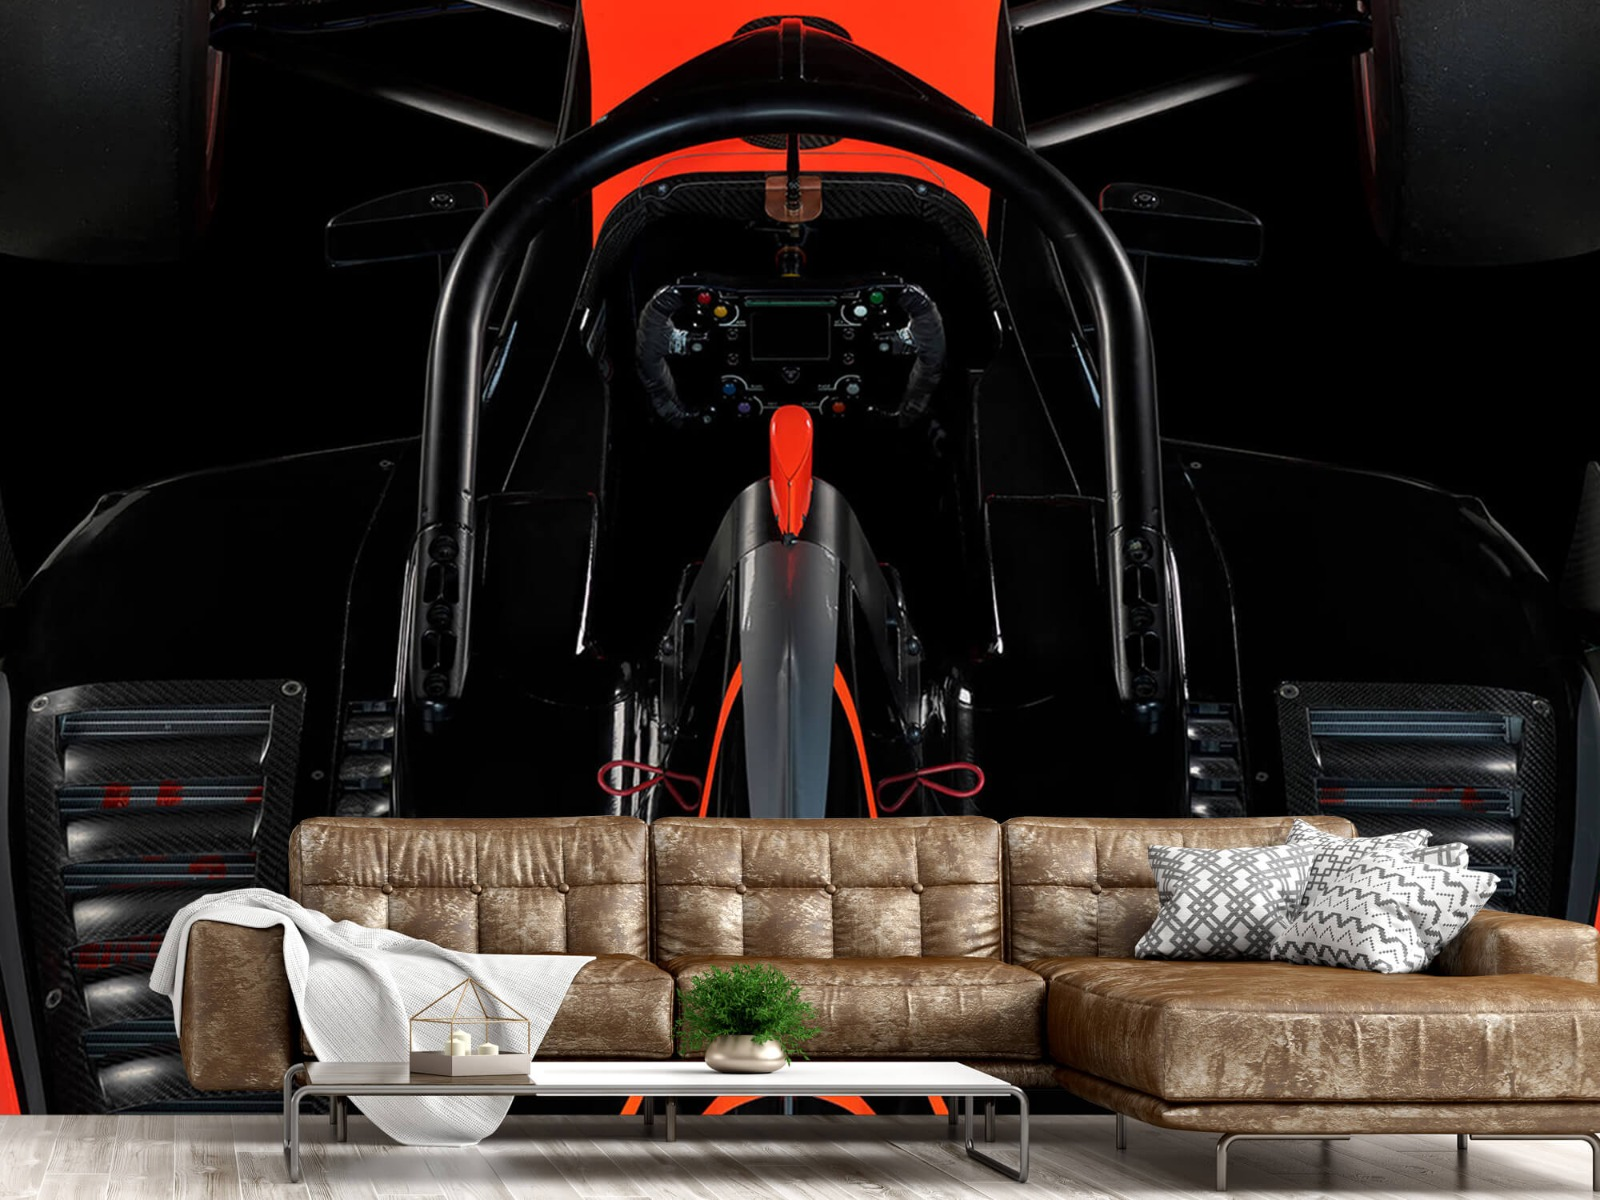 Sportauto's - Formule 3 - Cockpit view - dark - Tienerkamer 13